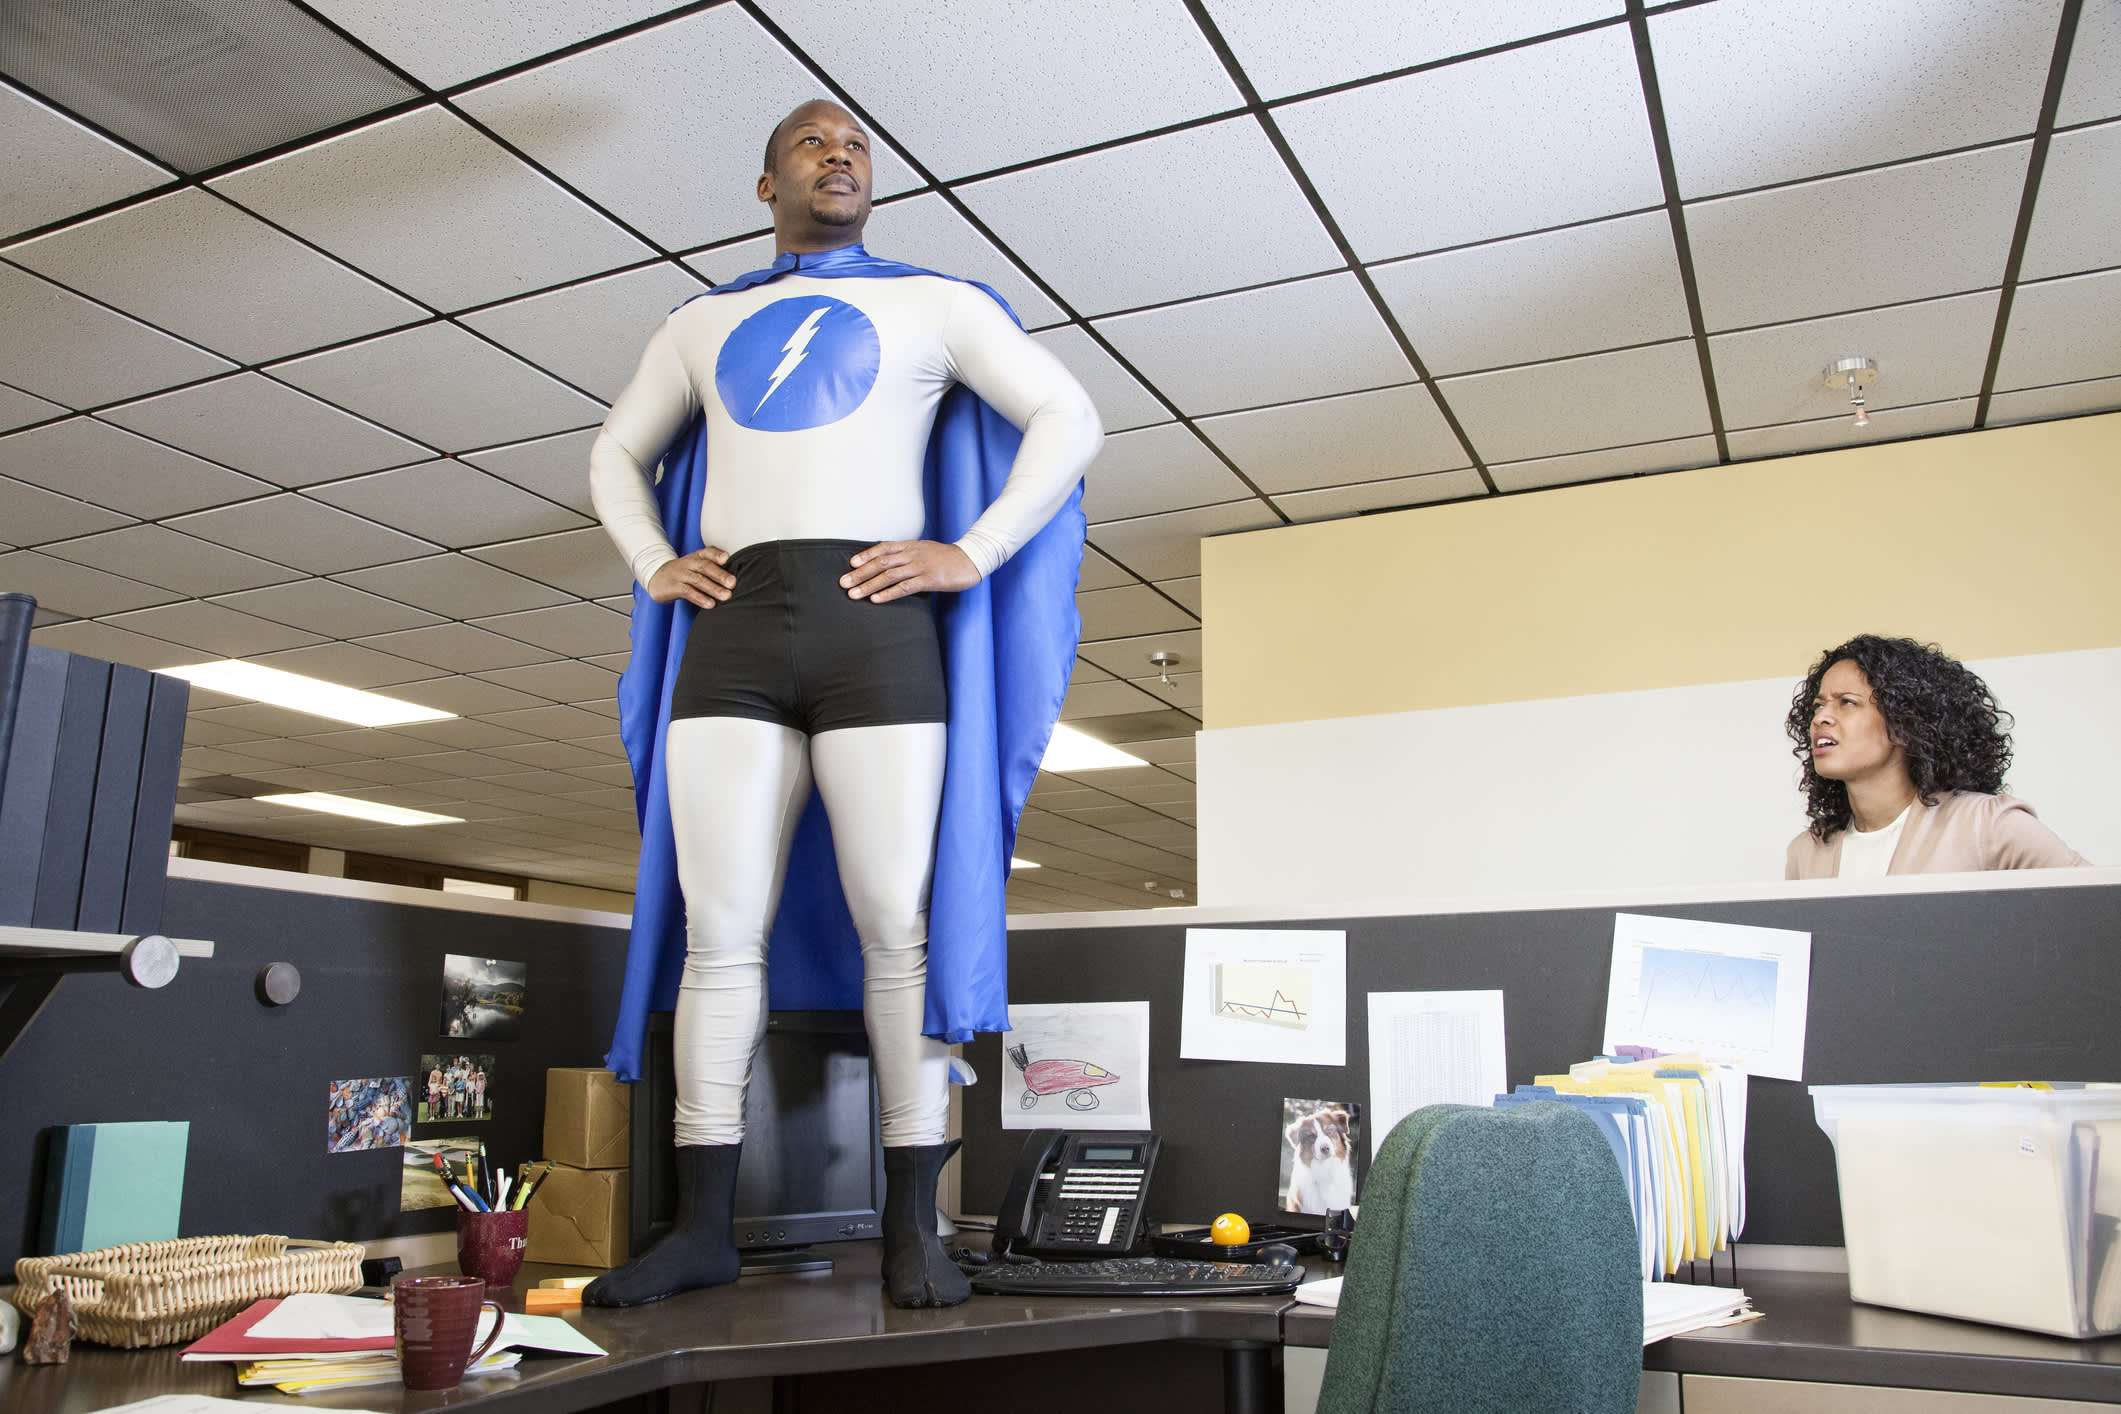 Gen Xers are the forgotten financial superheroes